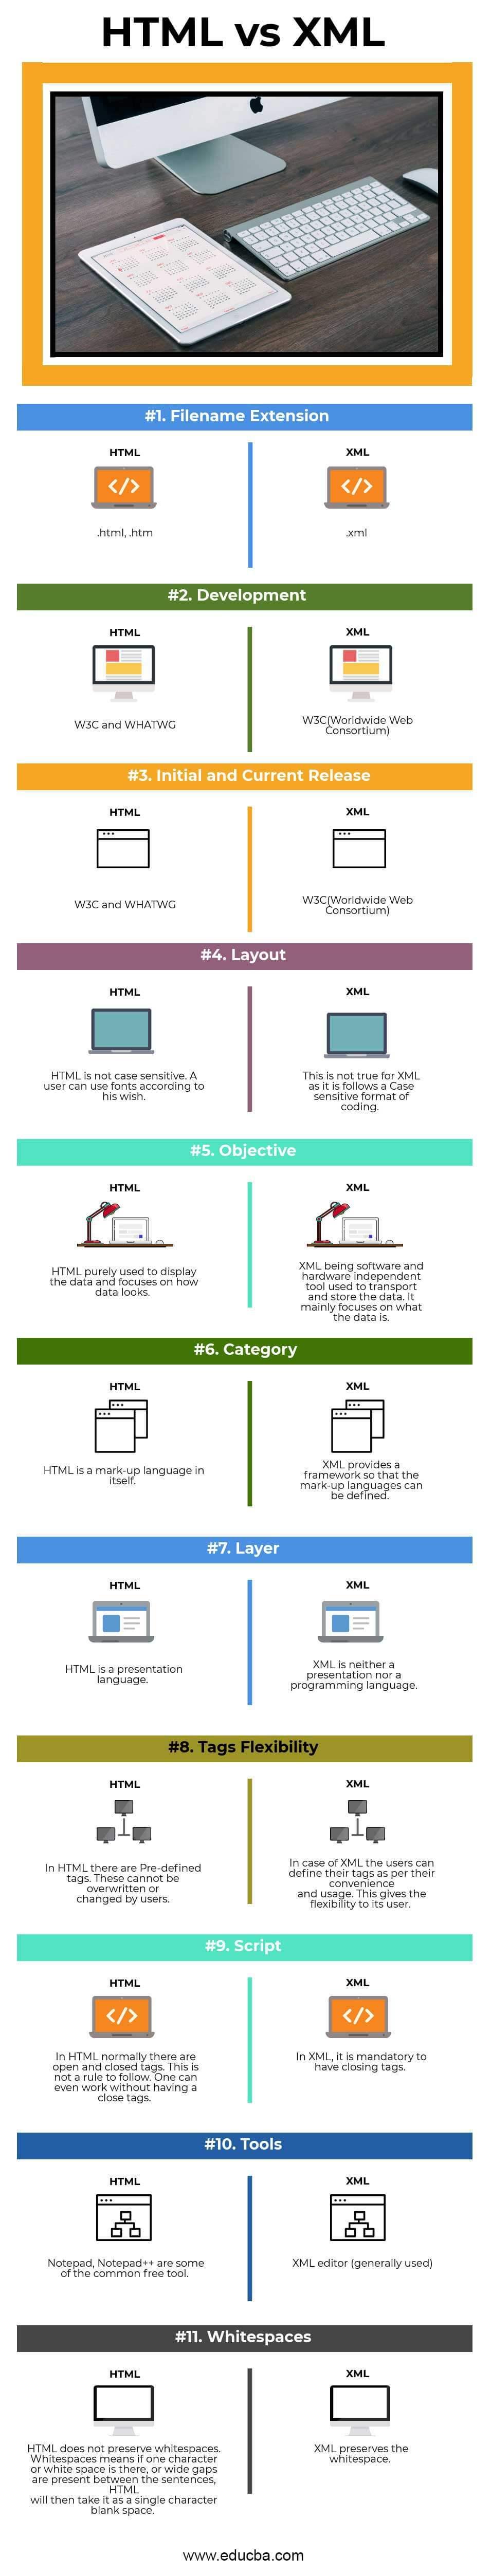 html vs xml find out the 11 useful comparisons XML vs XHTML html vs xml infographics